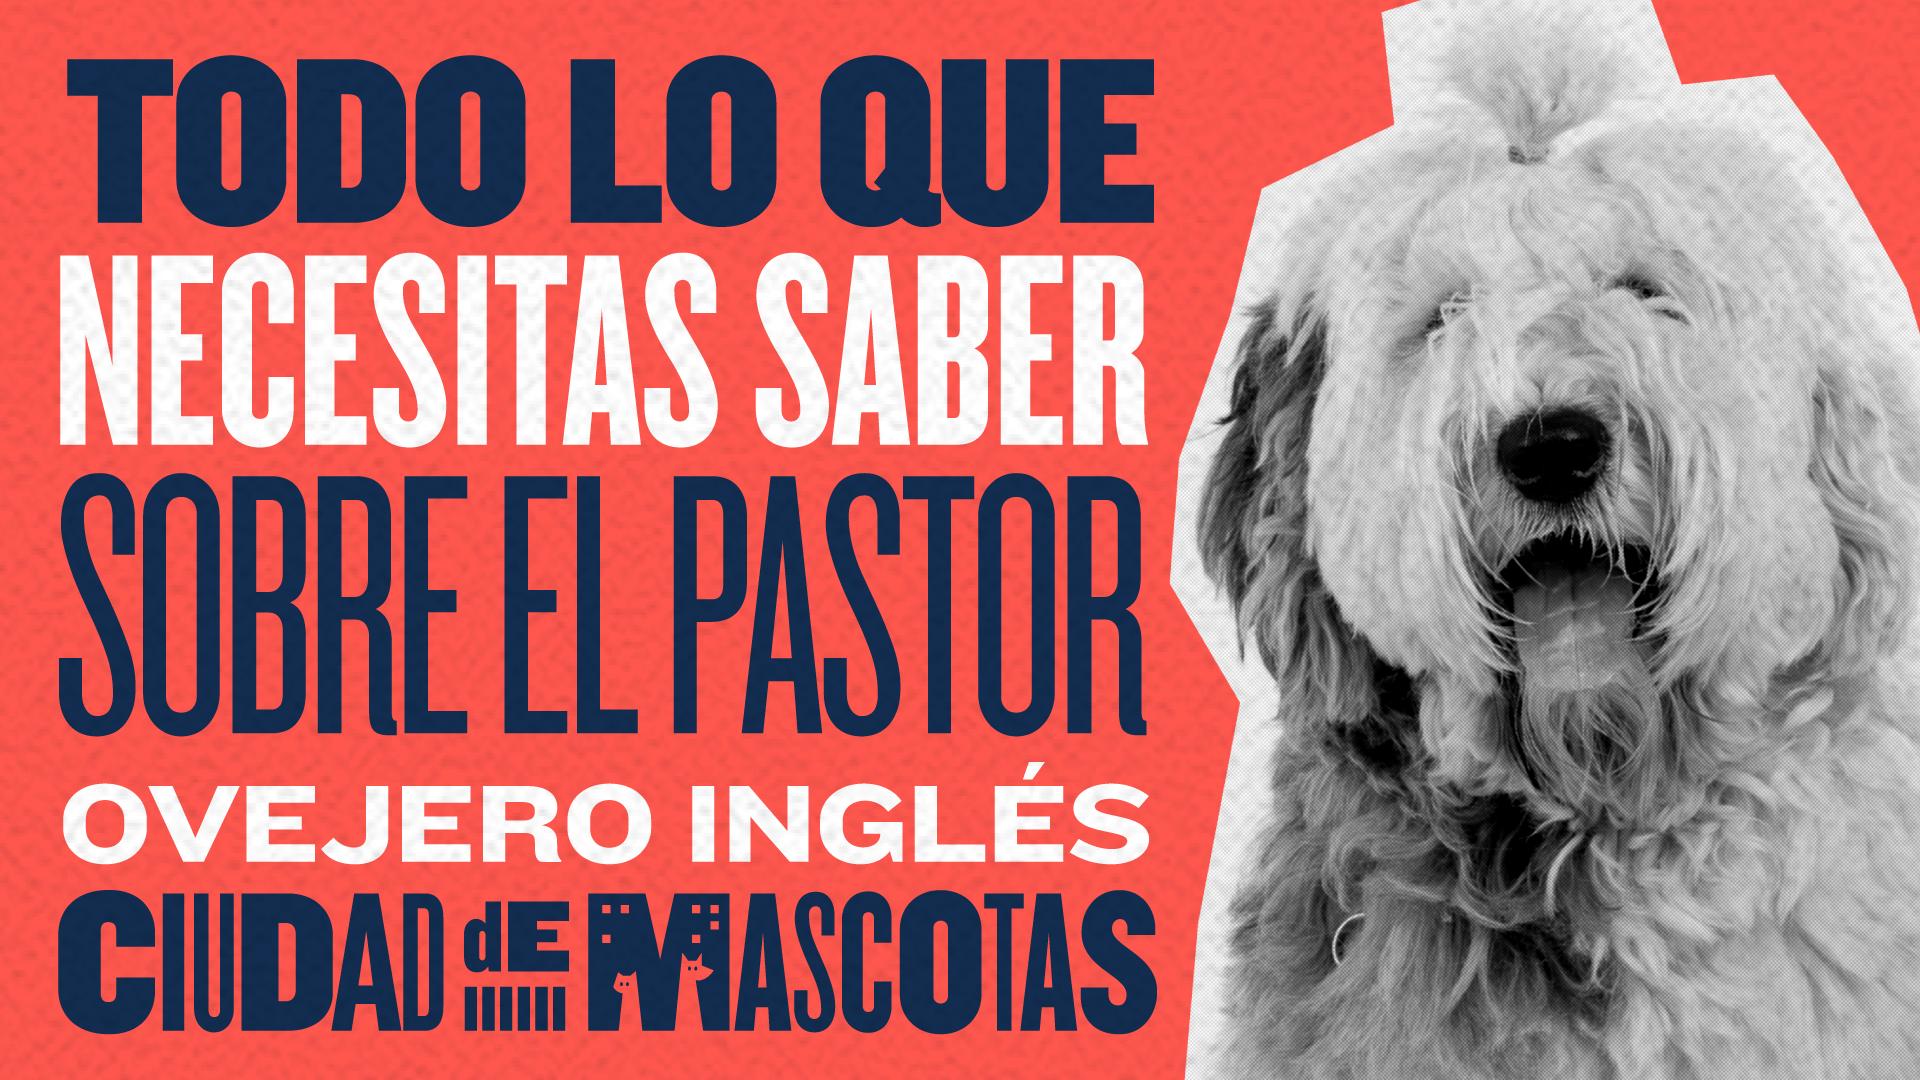 Pastor Ovejero Ingles